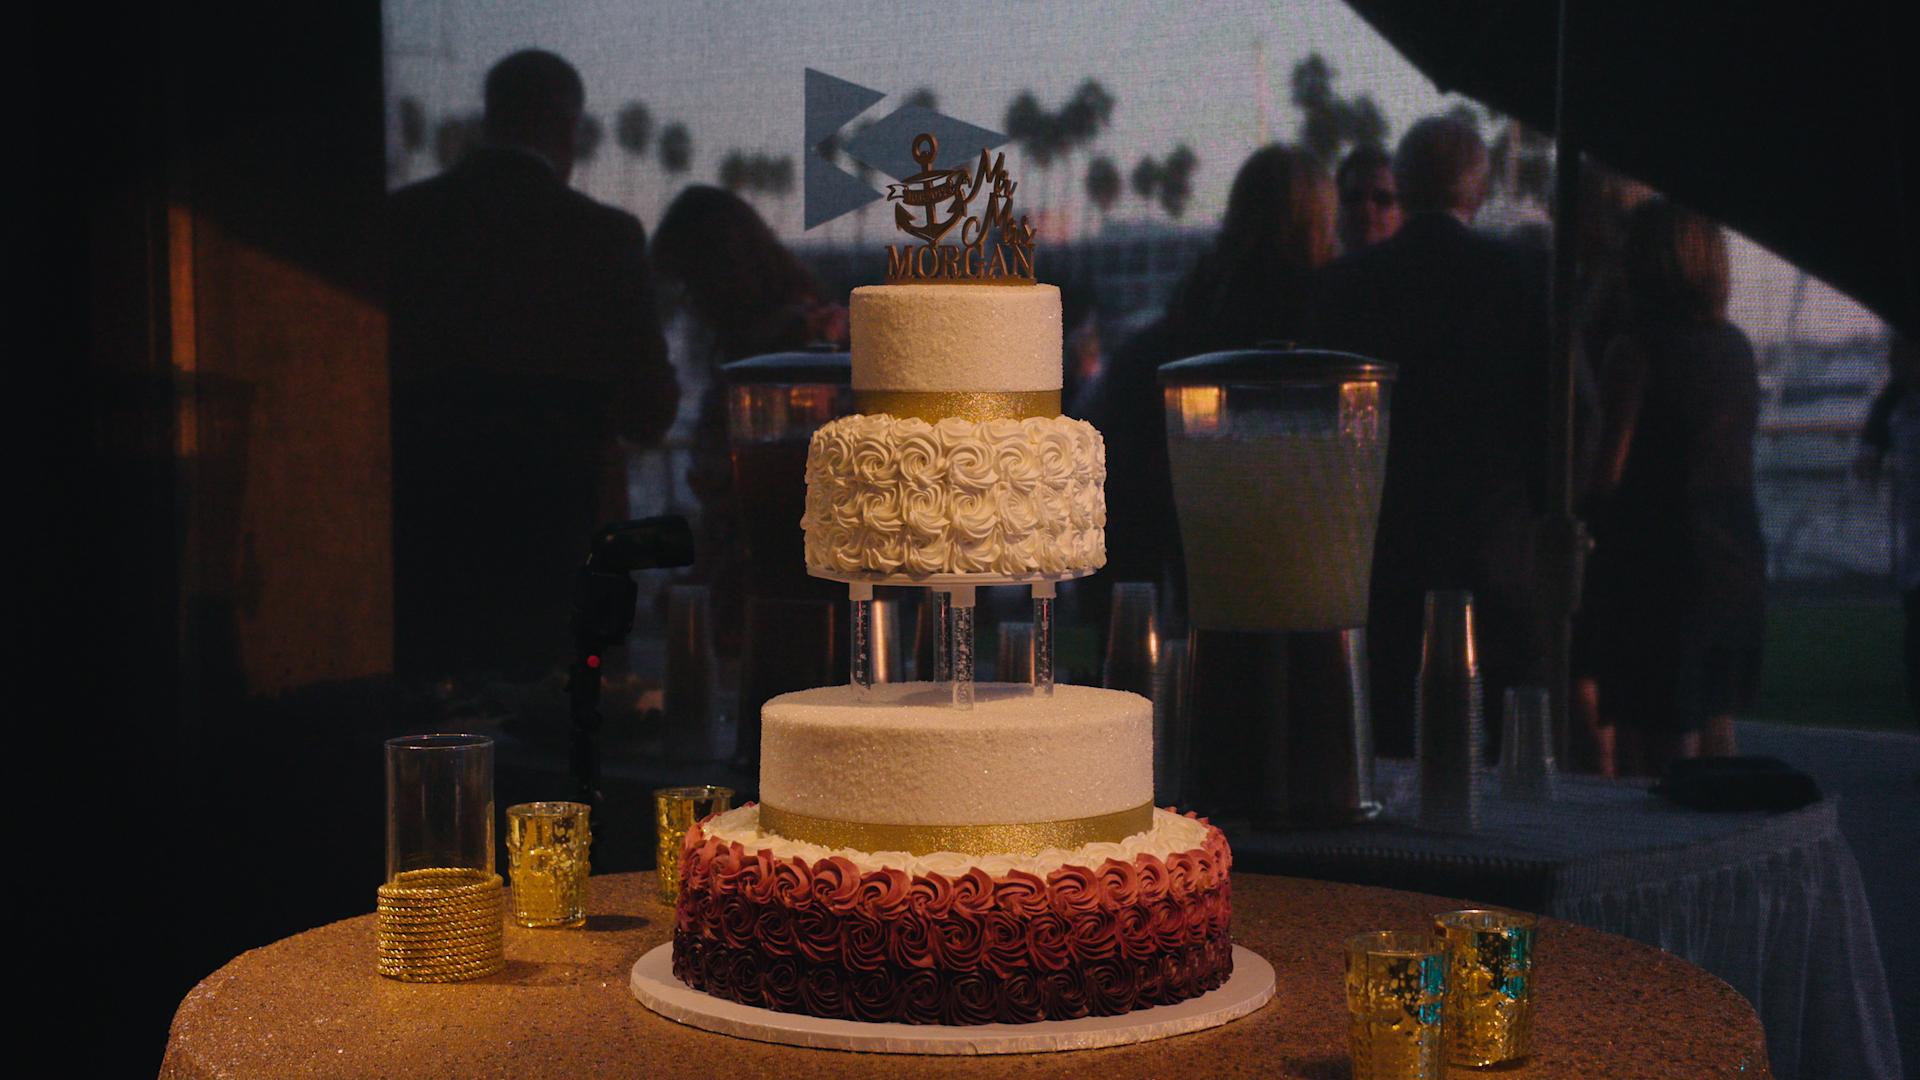 Cake0.jpg